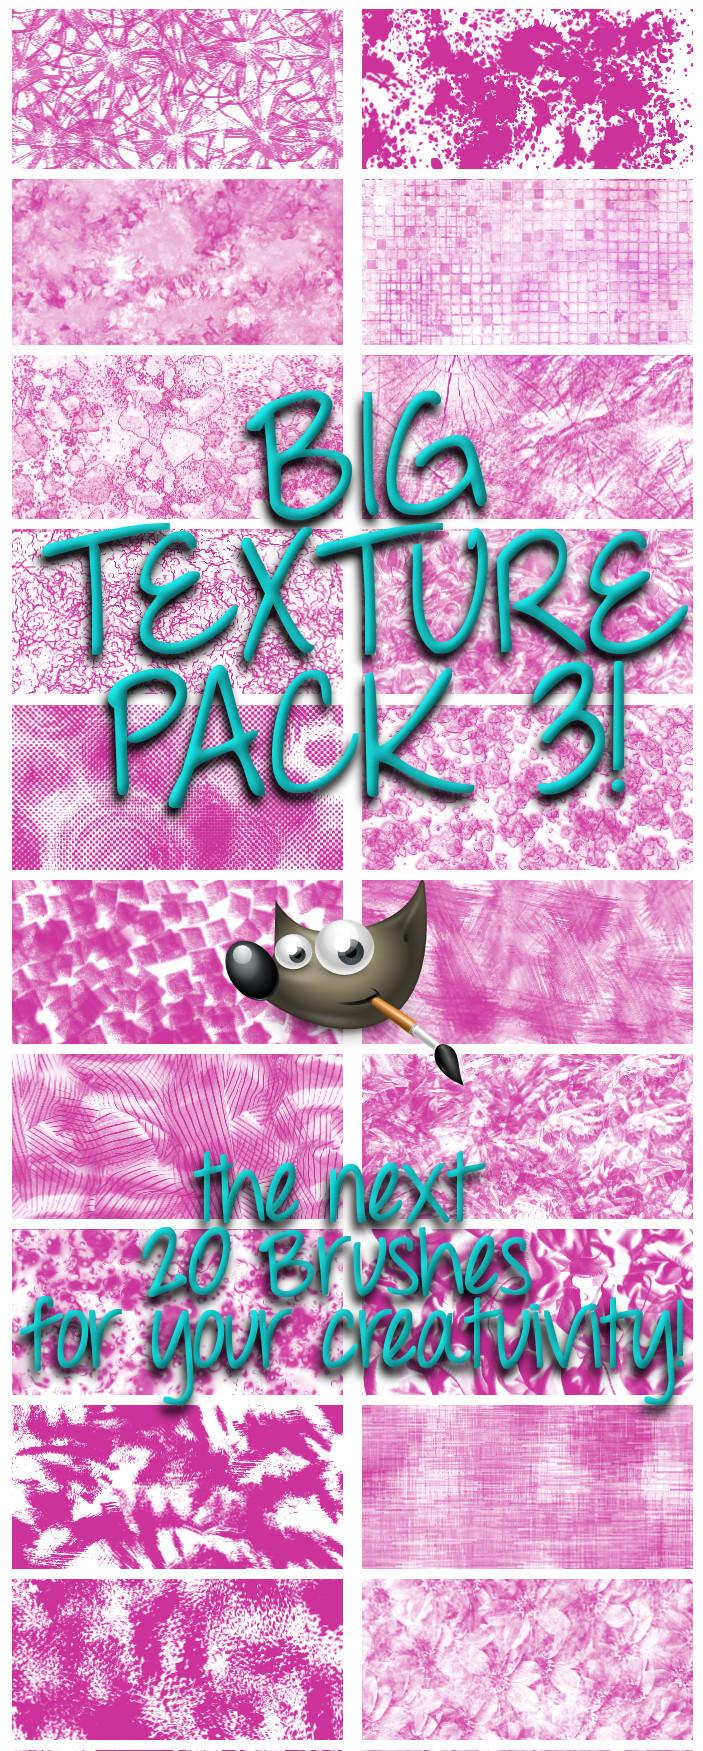 GIMP-Texture-Brush-Set 3 by Chrisdesign on DeviantArt